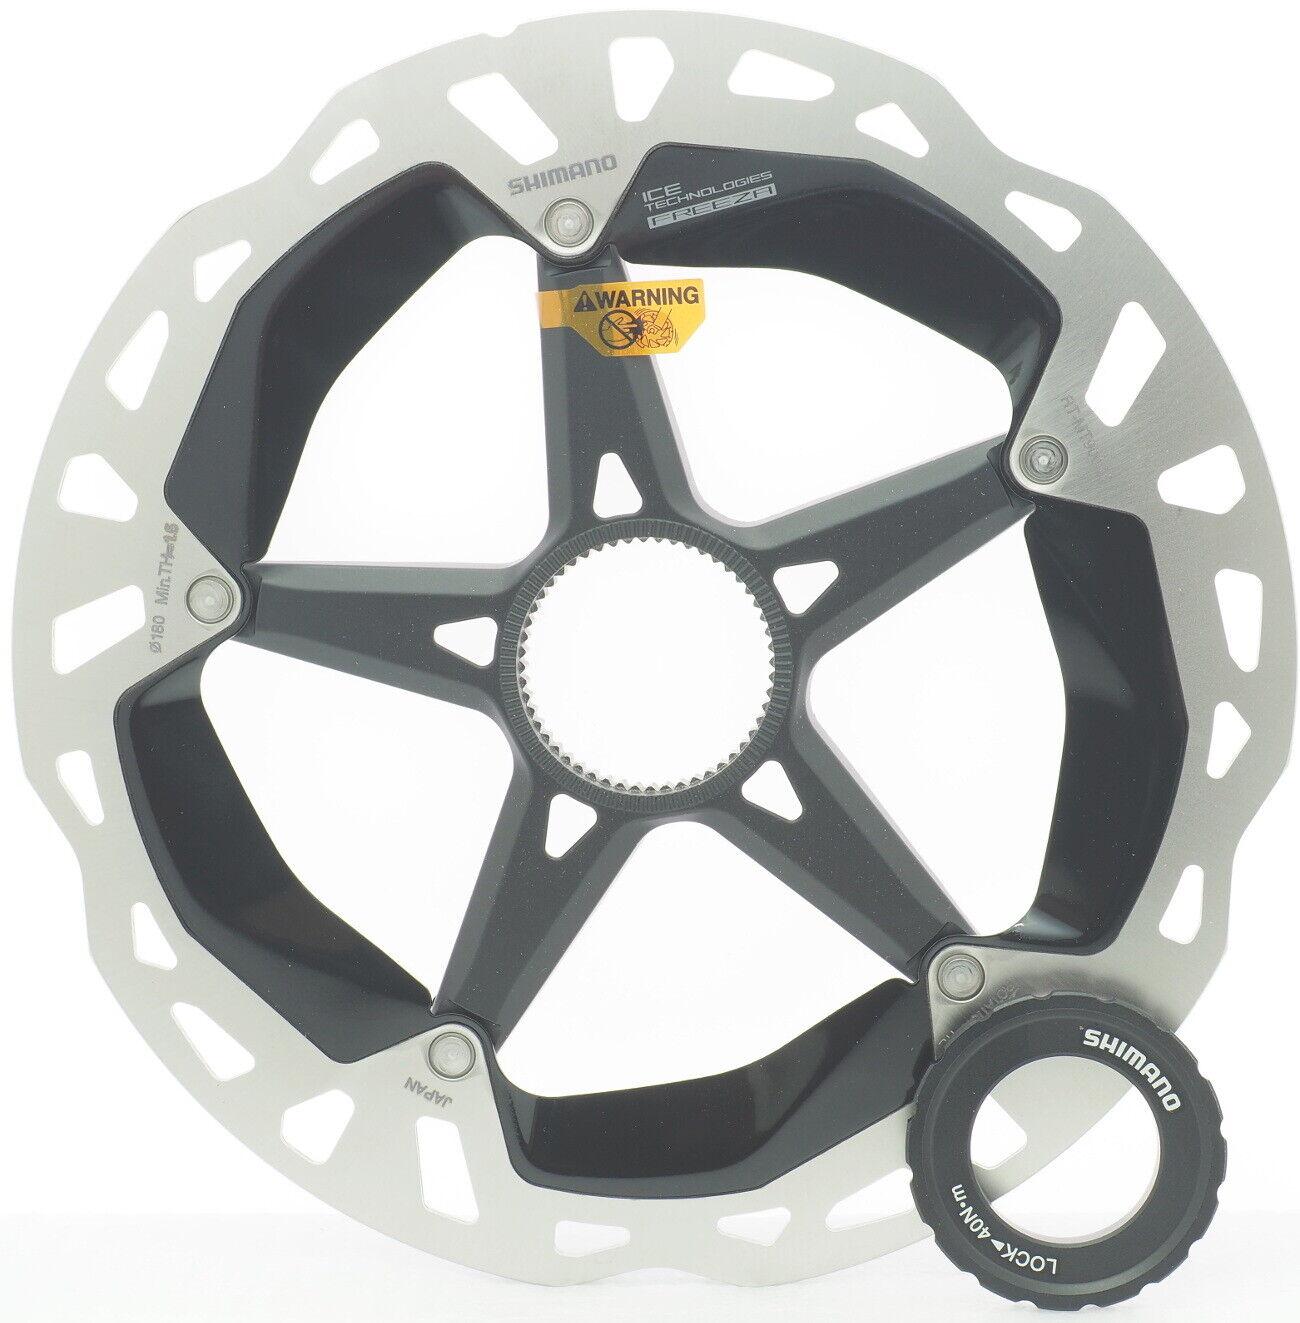 Shimano XTR RT-MT900-M ICE-TECH Center Lock Disc Brake Rotor 180mm NIB READ